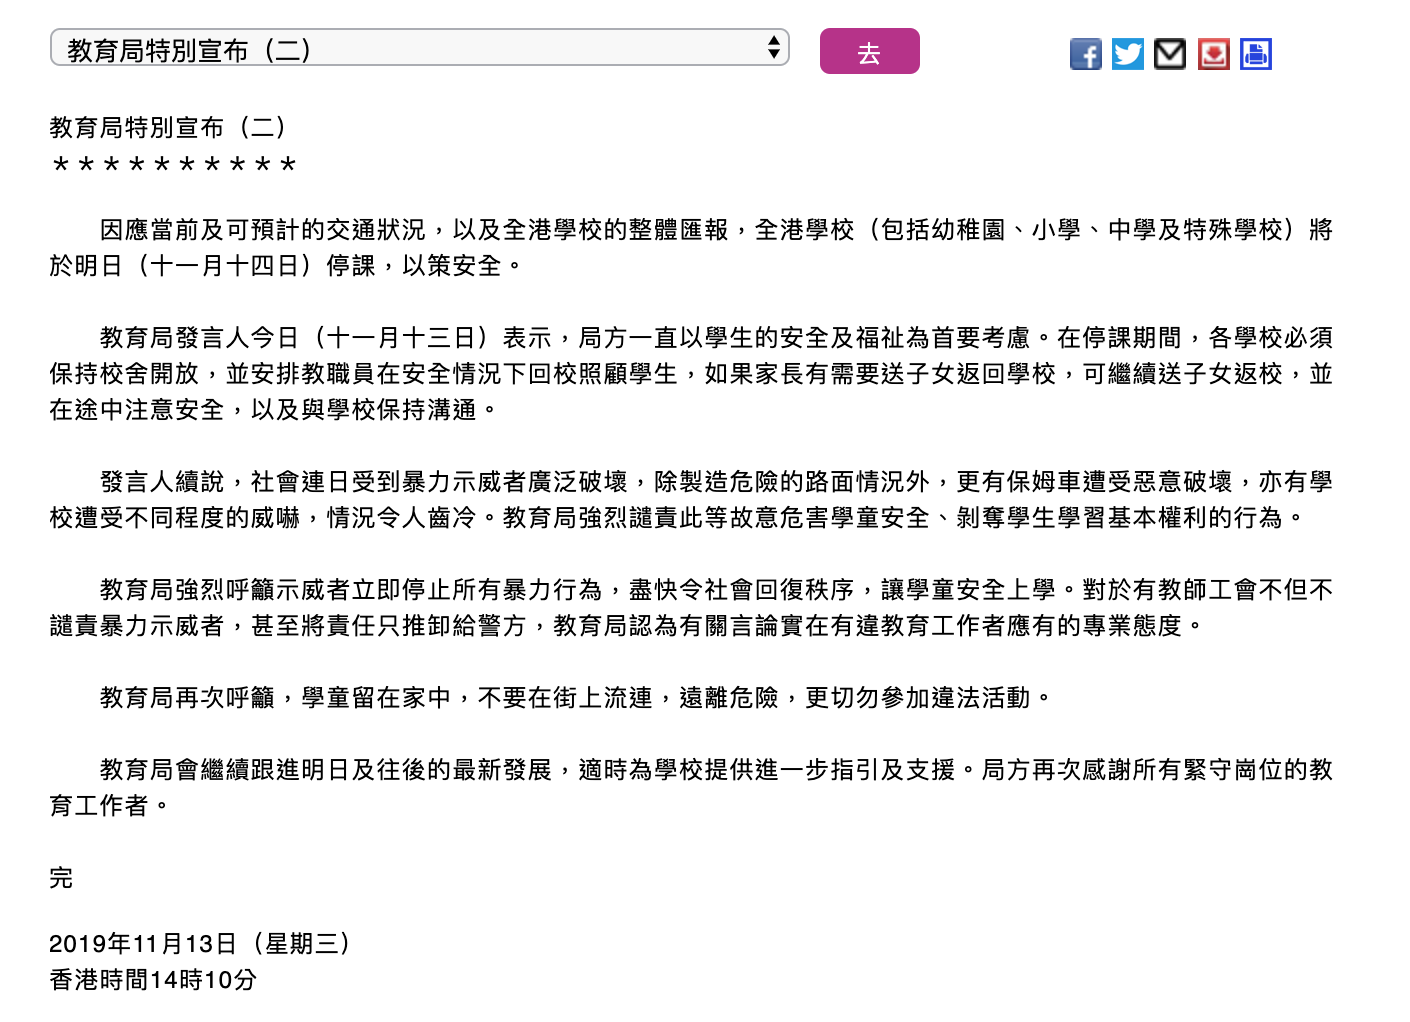 Photo of 13/11(14:10)教育局特別宣布